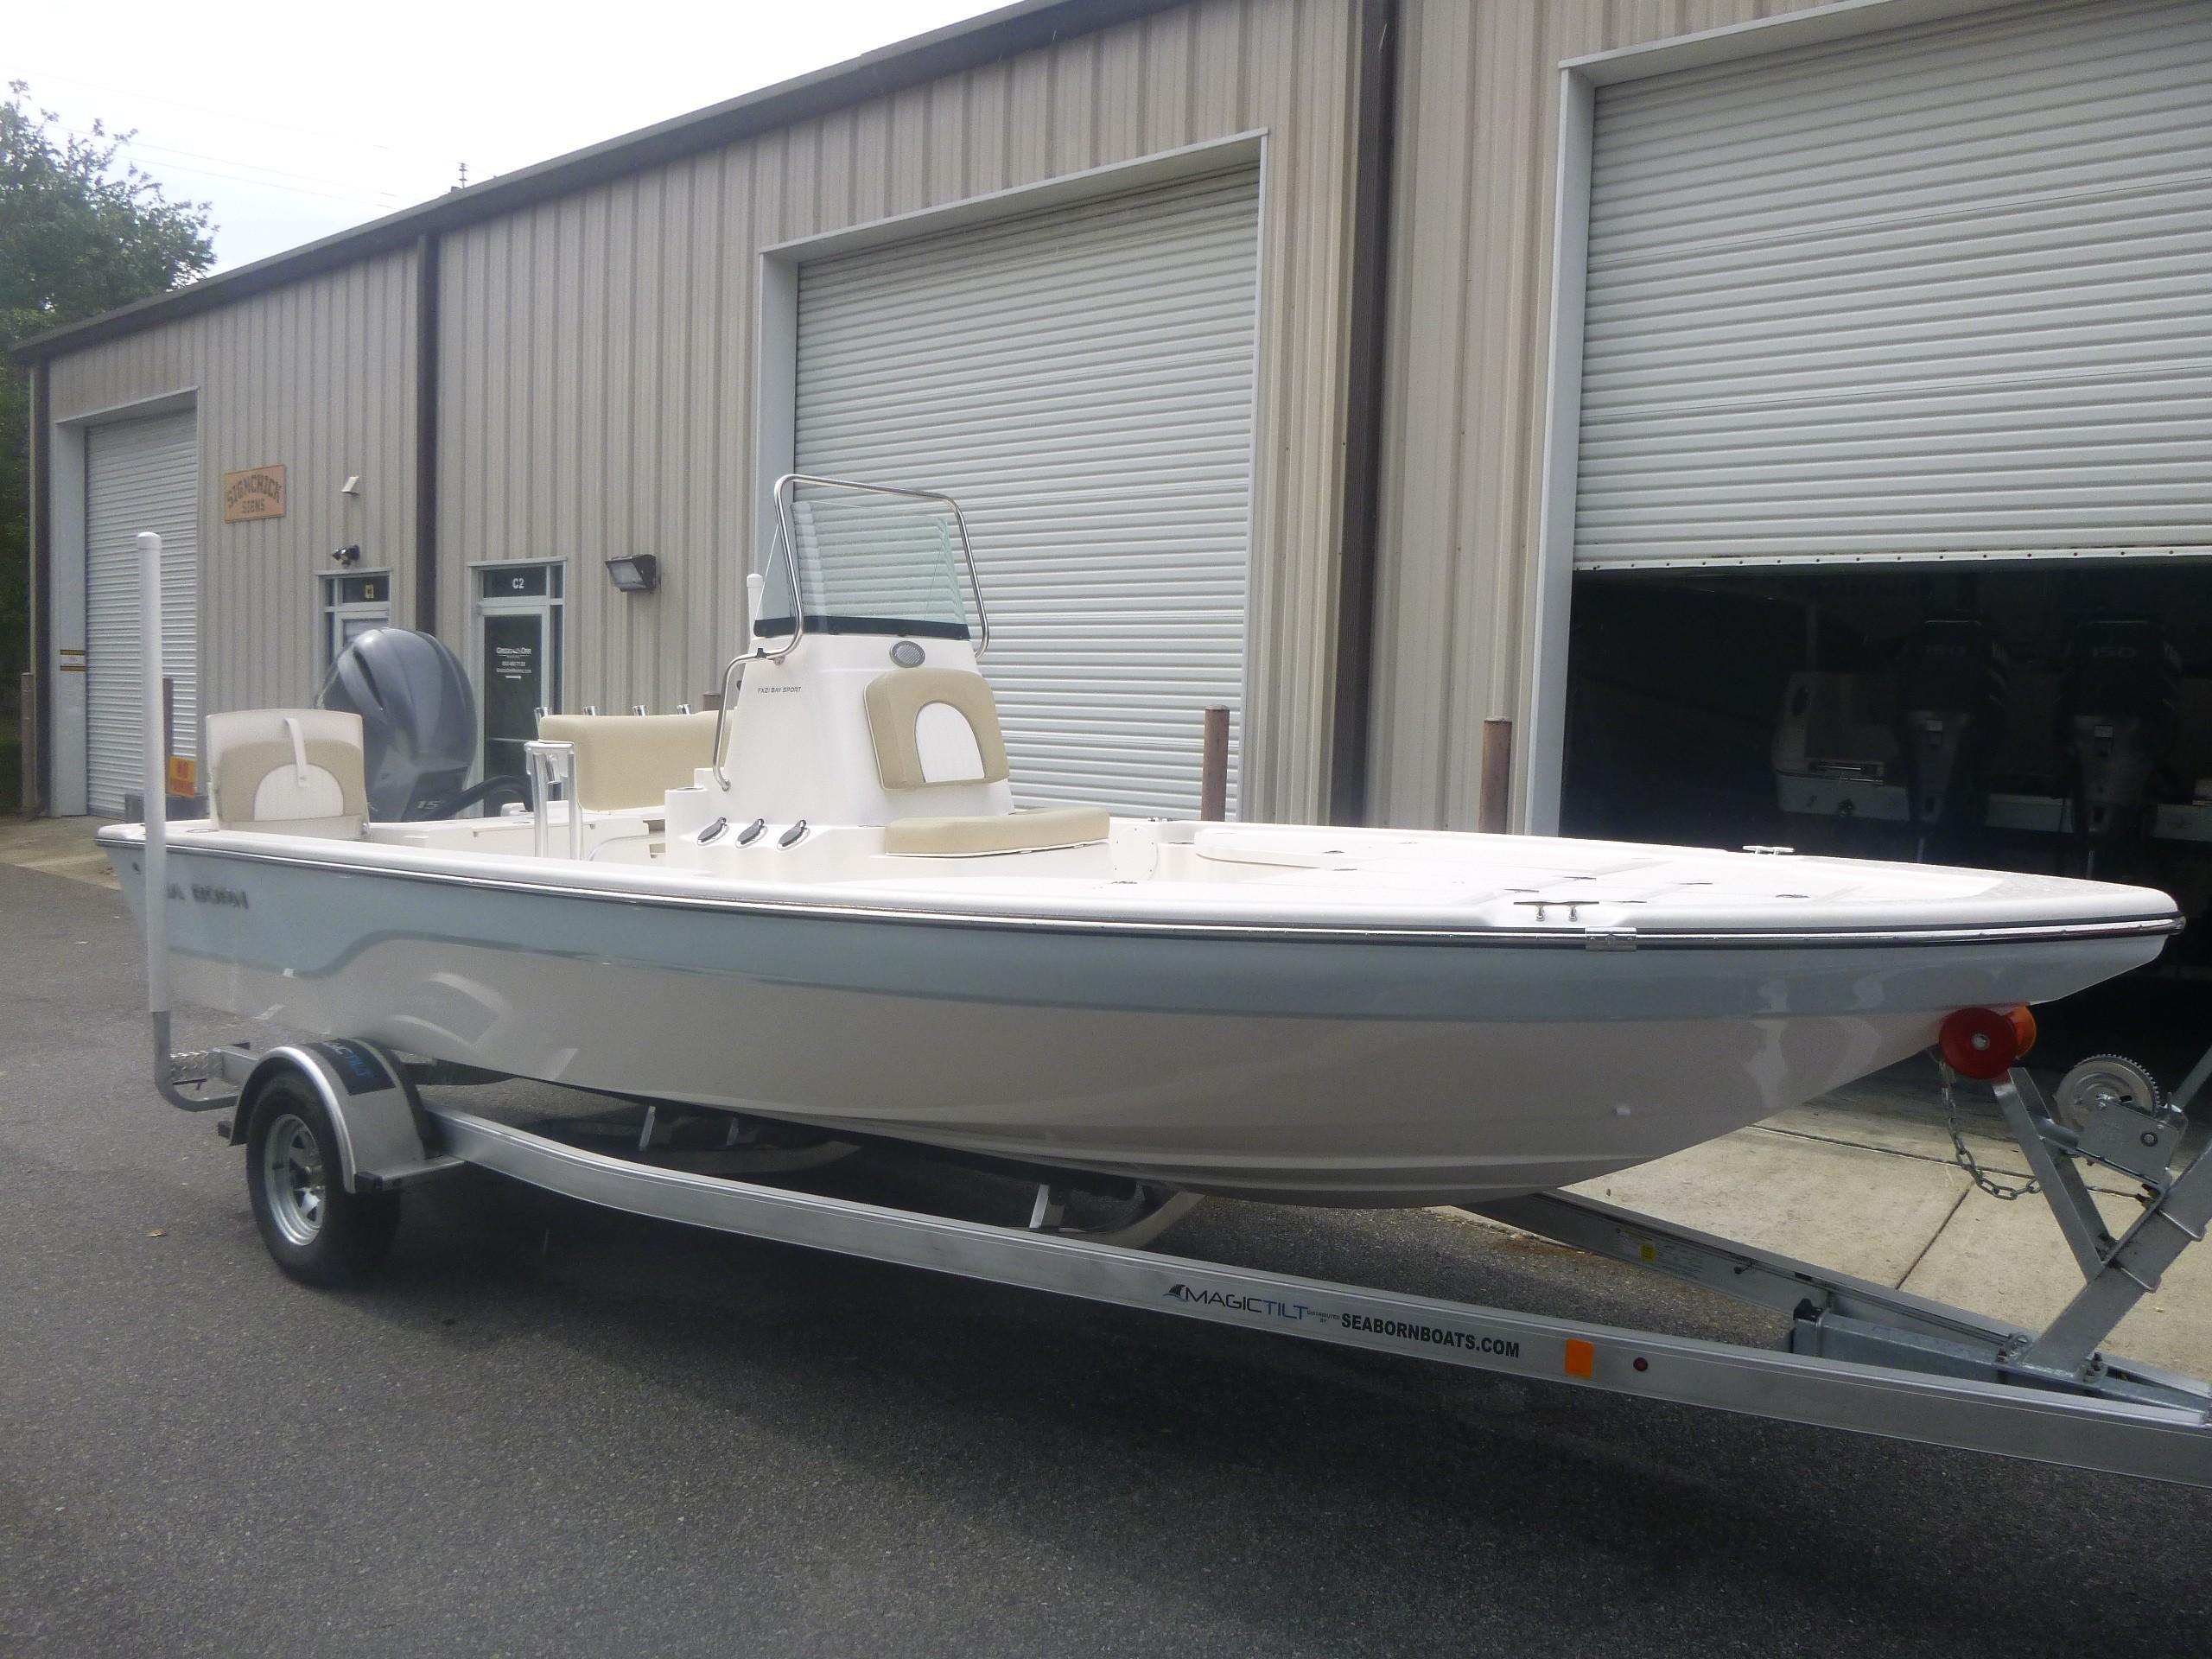 2019 Sea Born FX21 Sport Destin, Florida - Gregg Orr Marine of Destin